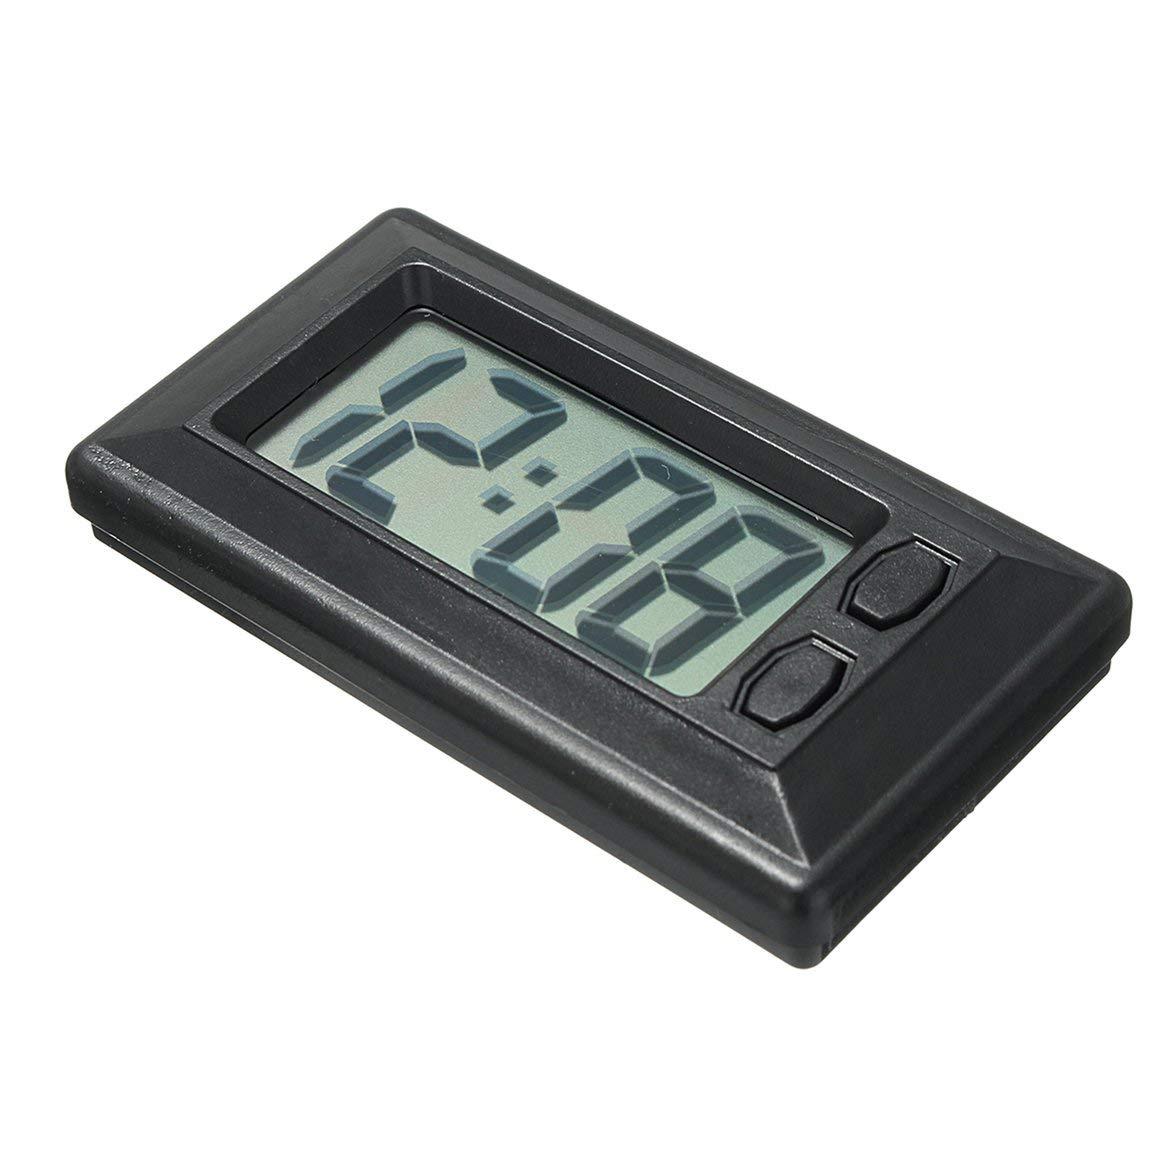 Kongqiabona Ultra-thin LCD Digital Display Car Vehicle Dashboard Clock with Calendar Display Mini Portable Automobile Accessories